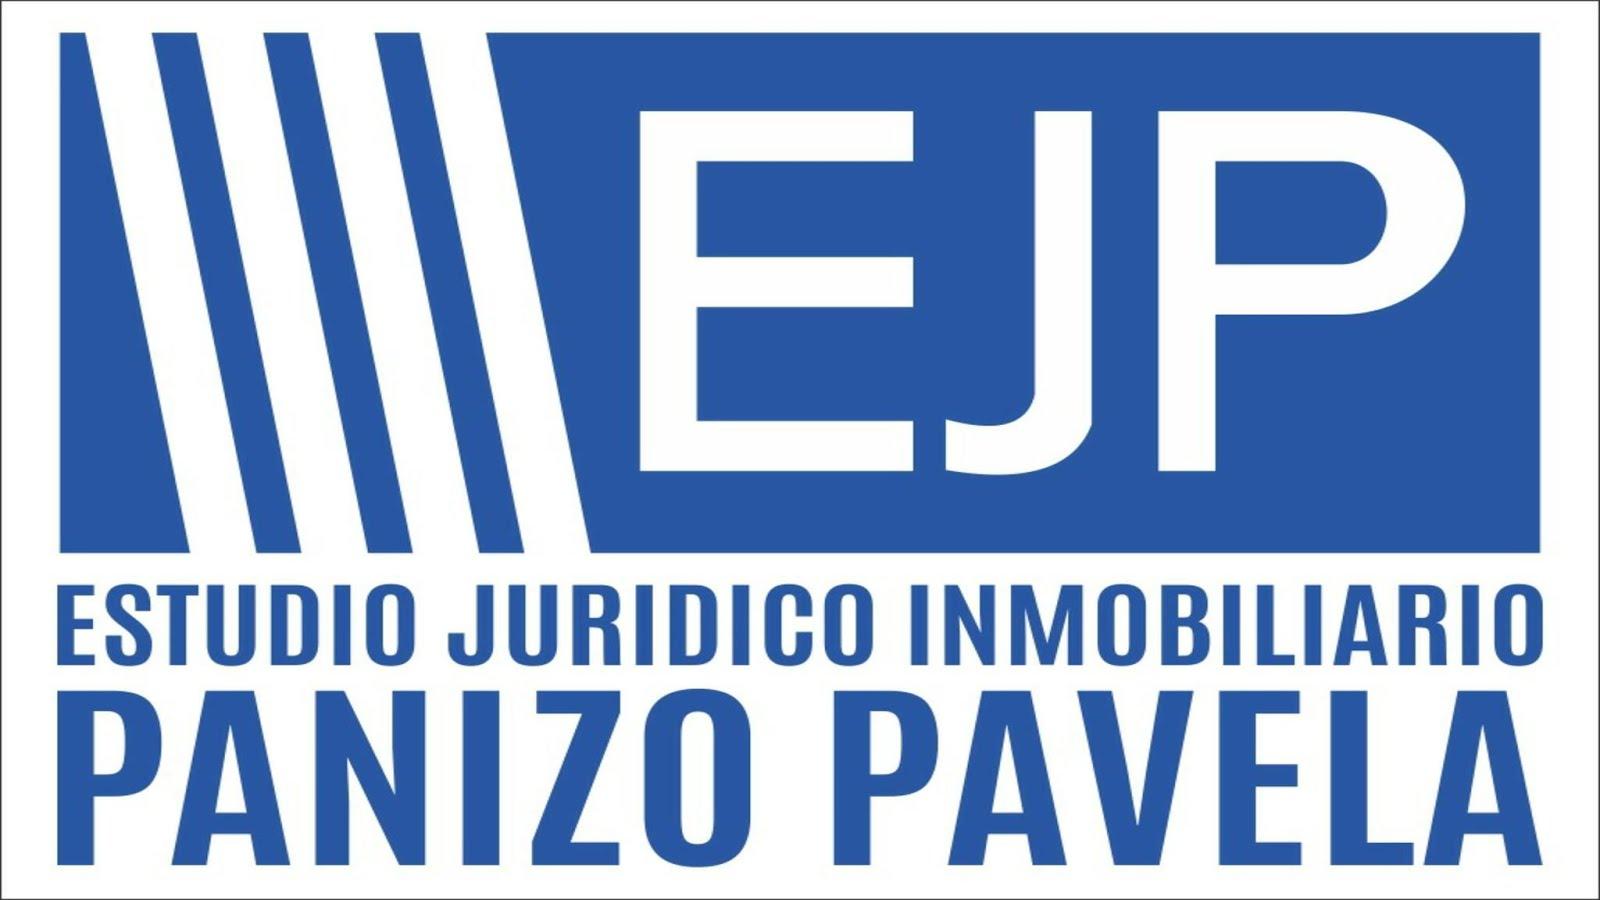 Estudio Jurídico EJP PANIZO PAVELA :: ABOGADOS MAR DEL PLATA :: Civil Comercial Penal Familia Inmob